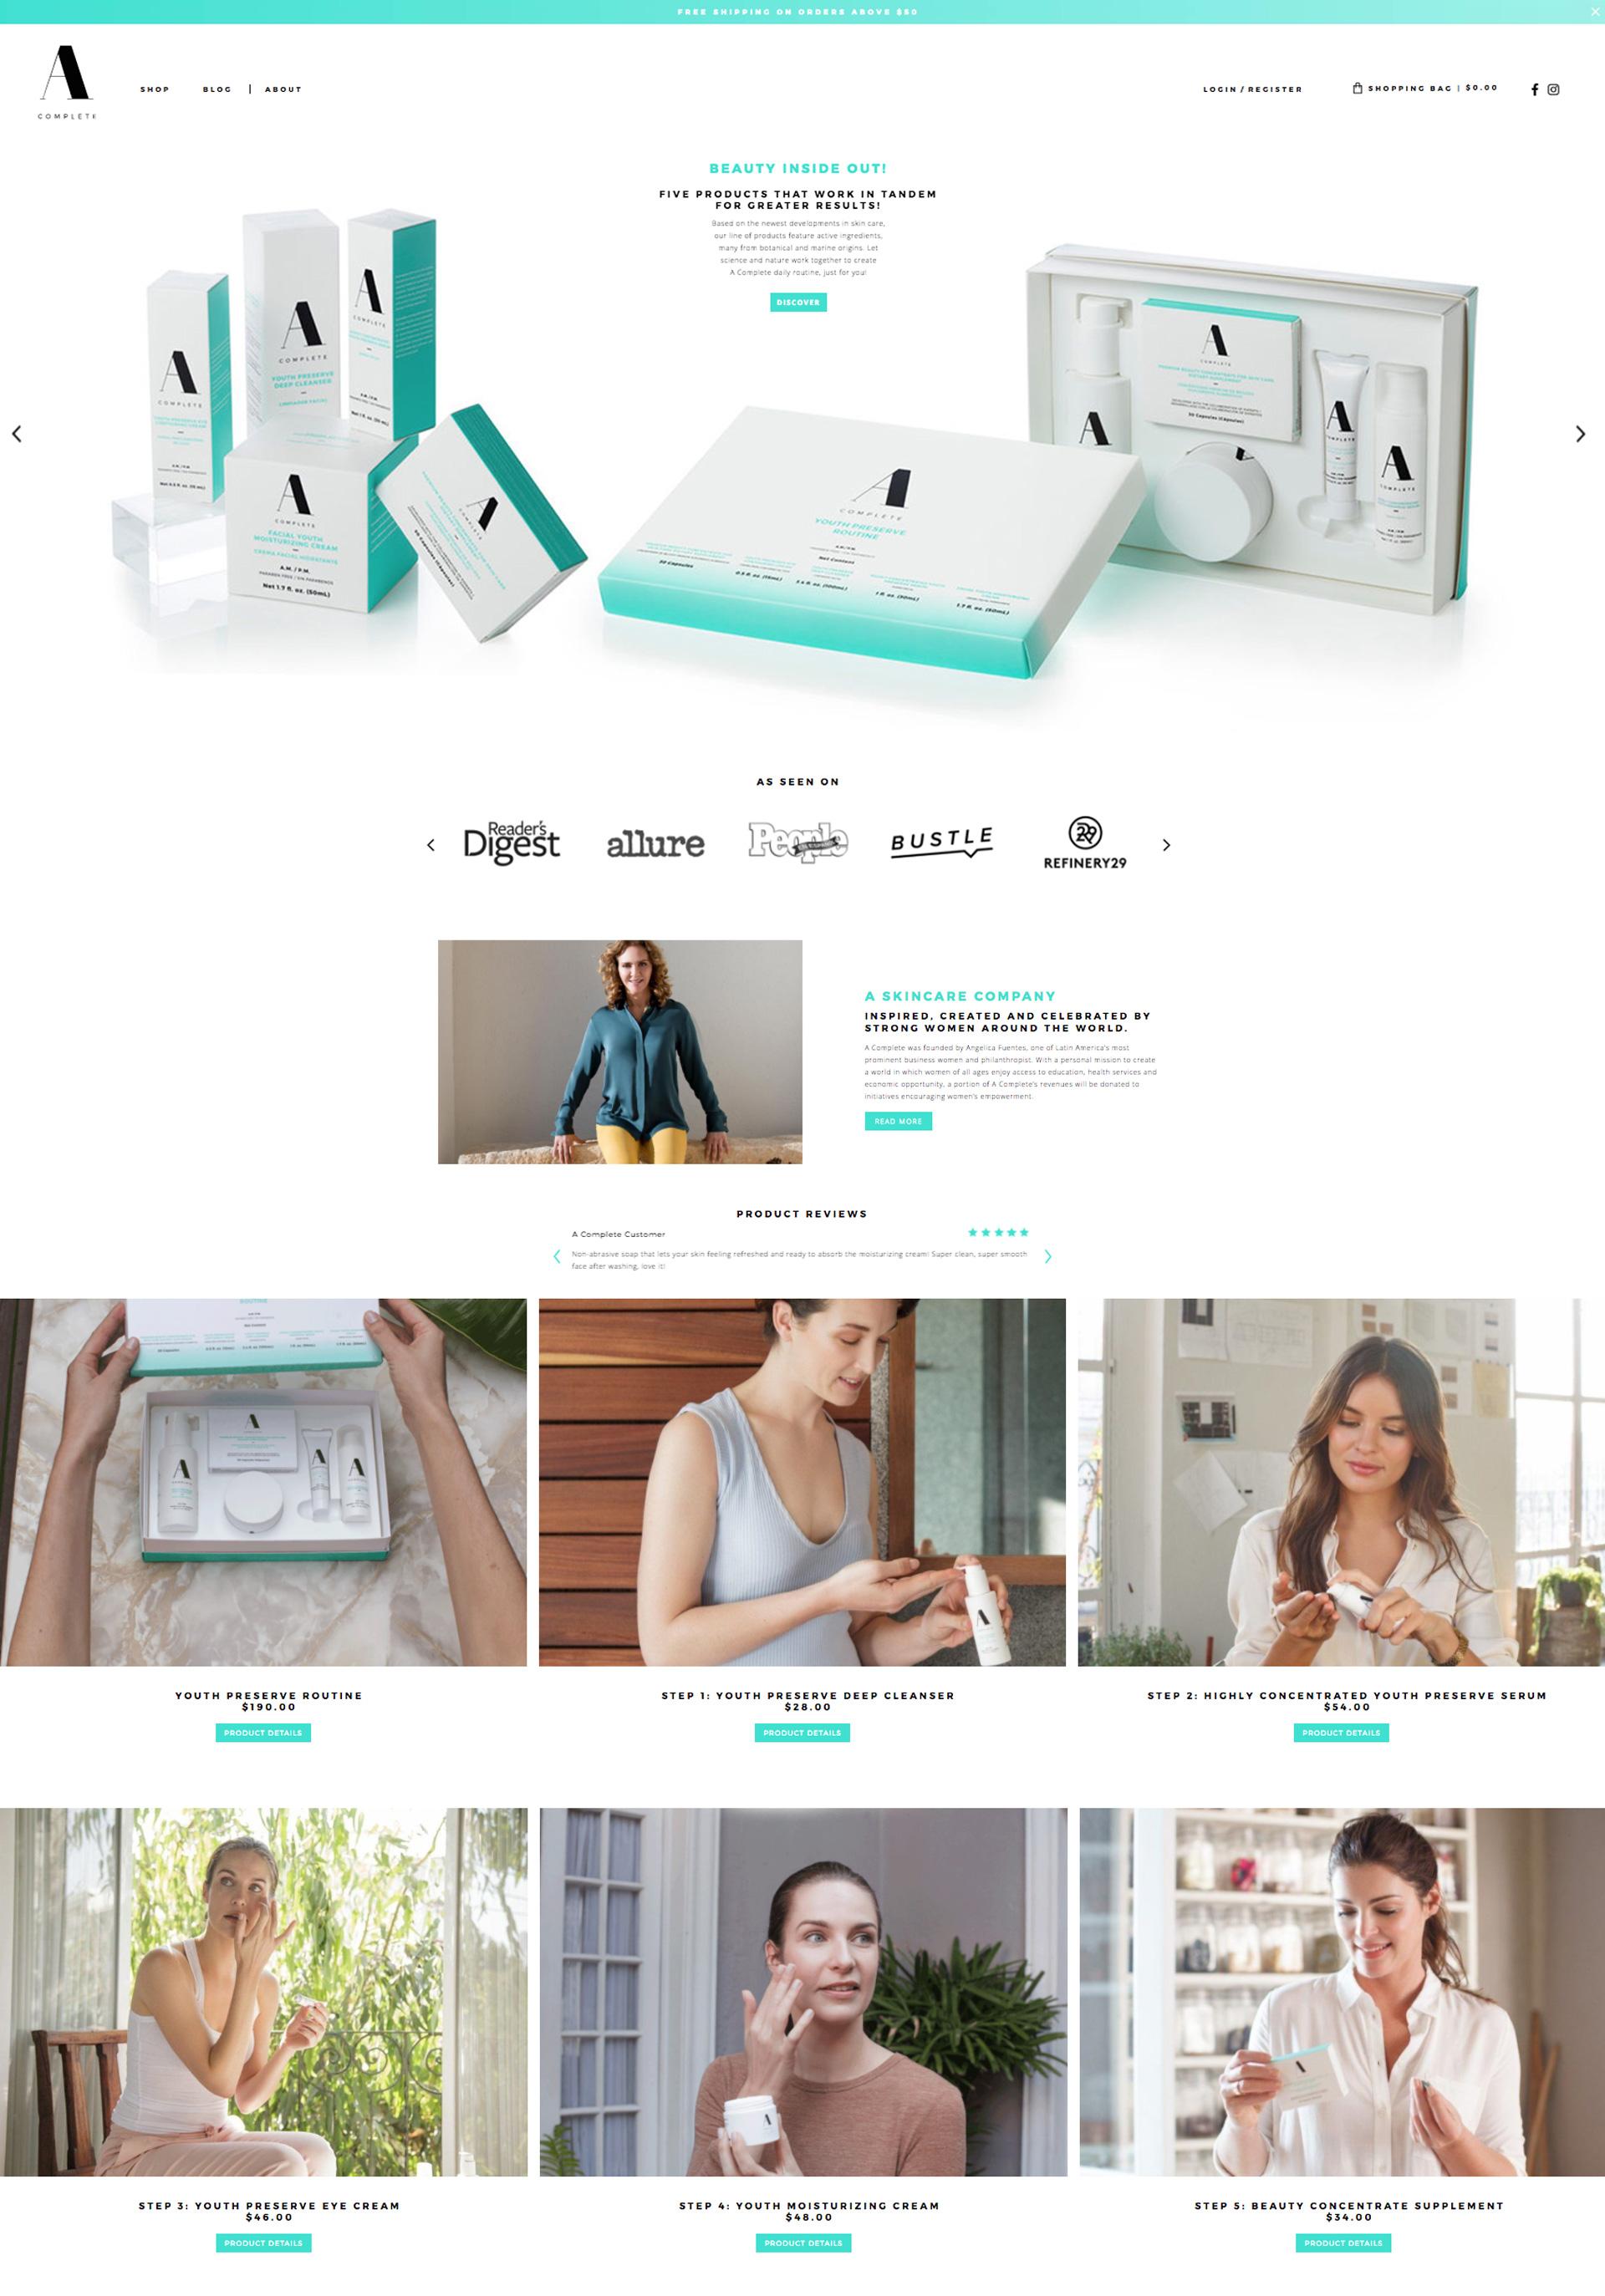 A Complete website look